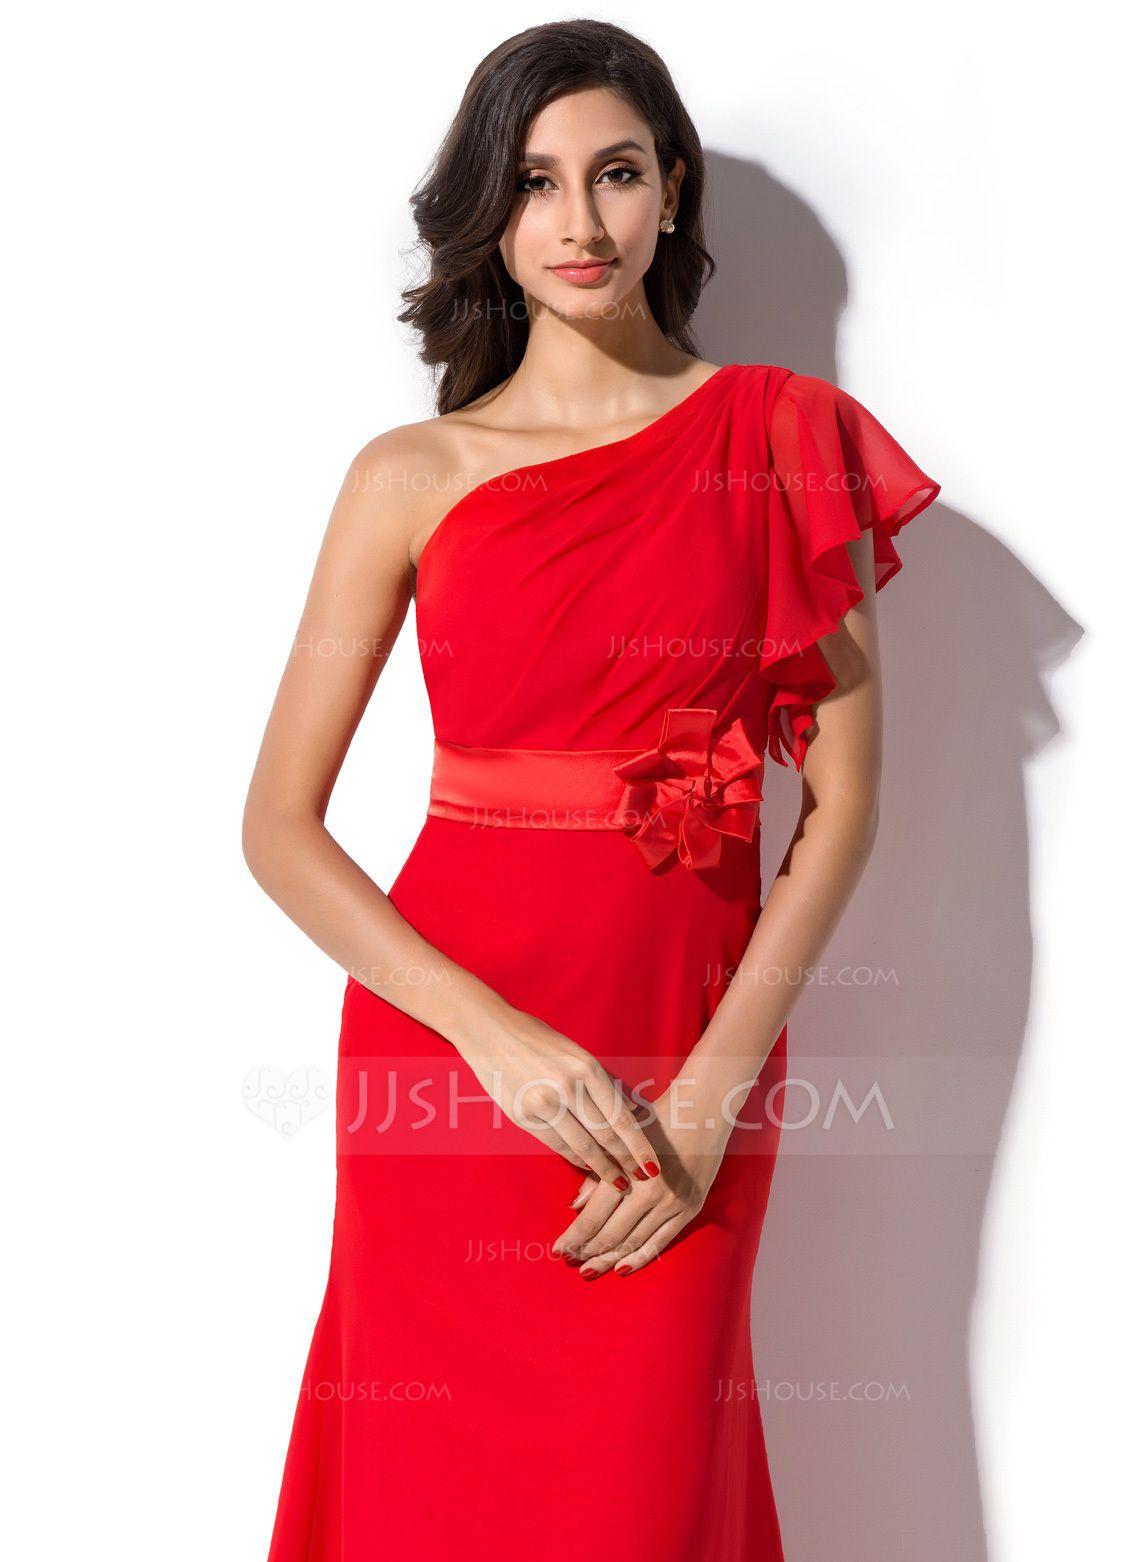 15a9b01b5 Sheath/Column One-Shoulder Floor-Length Chiffon Evening Dress With  Flower(s) Cascading Ruffles (017041074) - JJsHouse